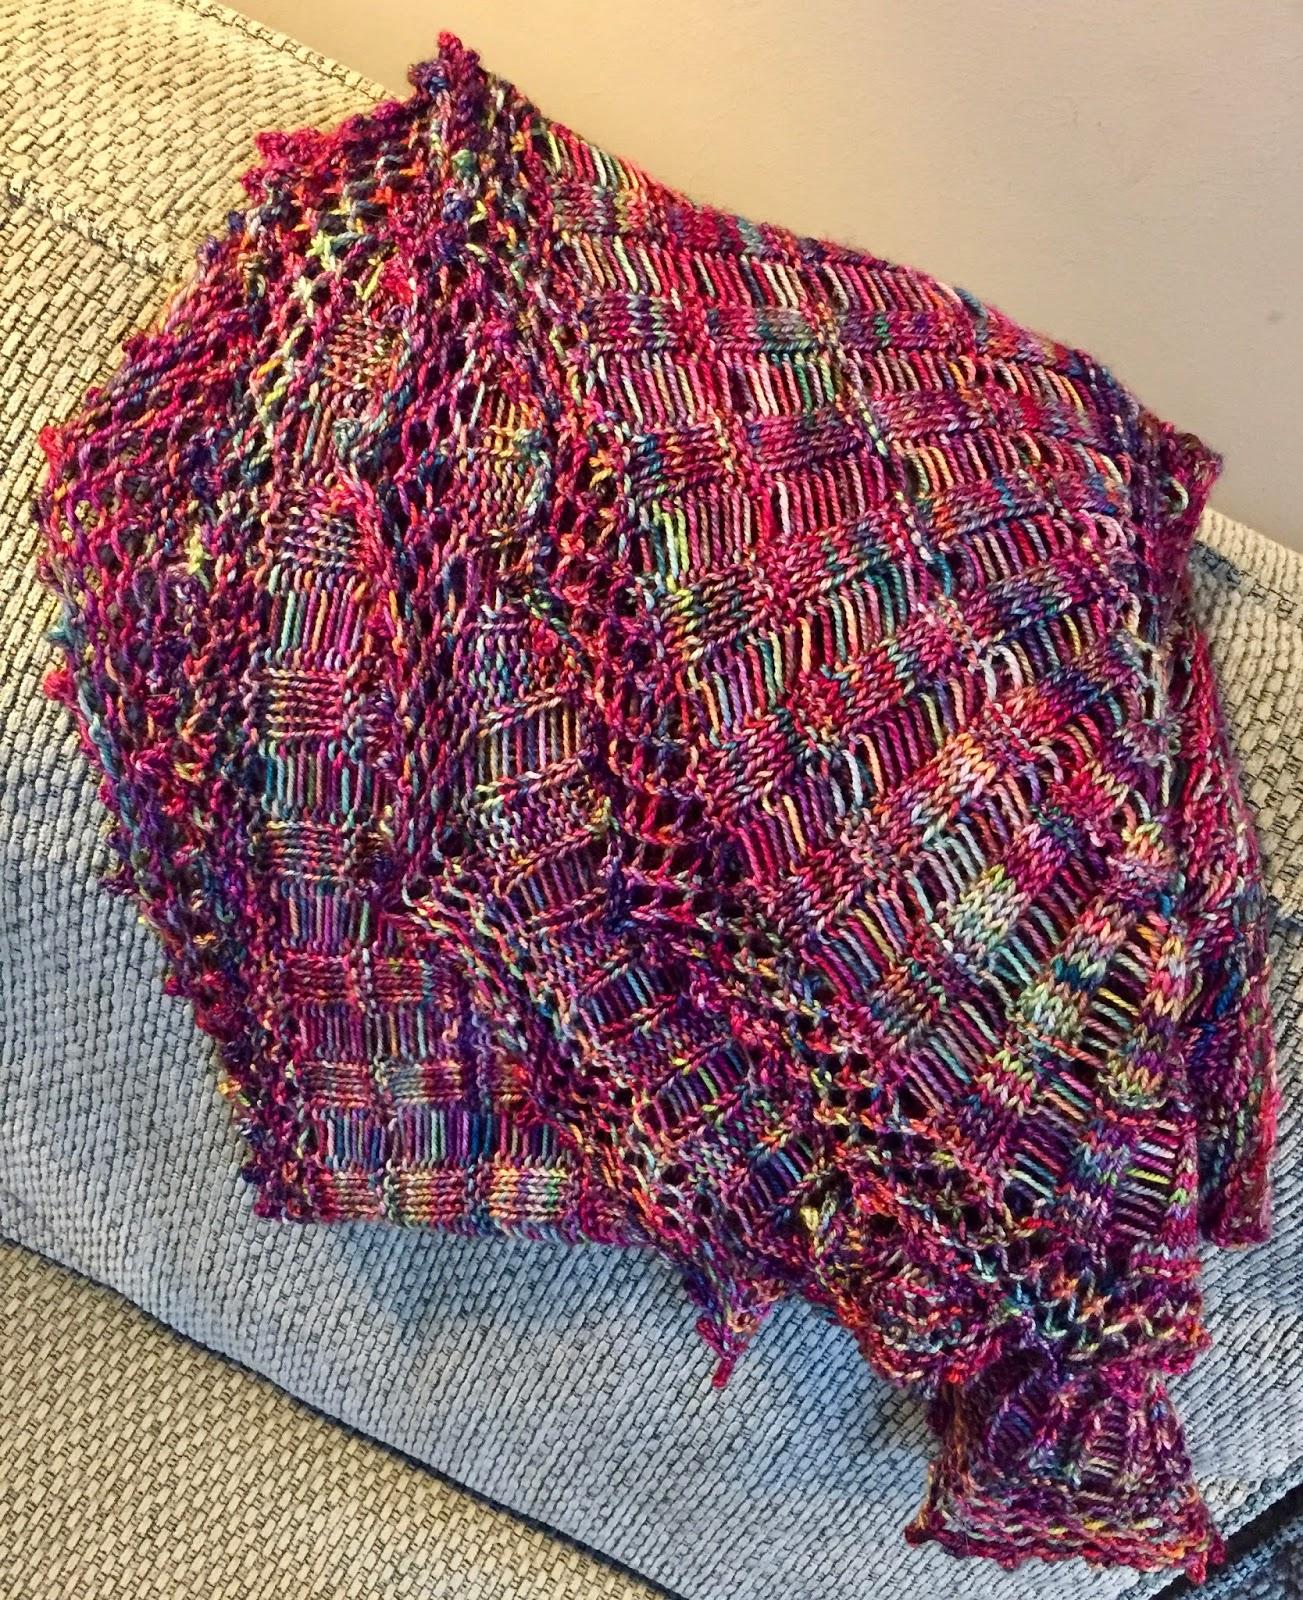 Cashmere Silk Scarf - June1 by VIDA VIDA 9qx1h